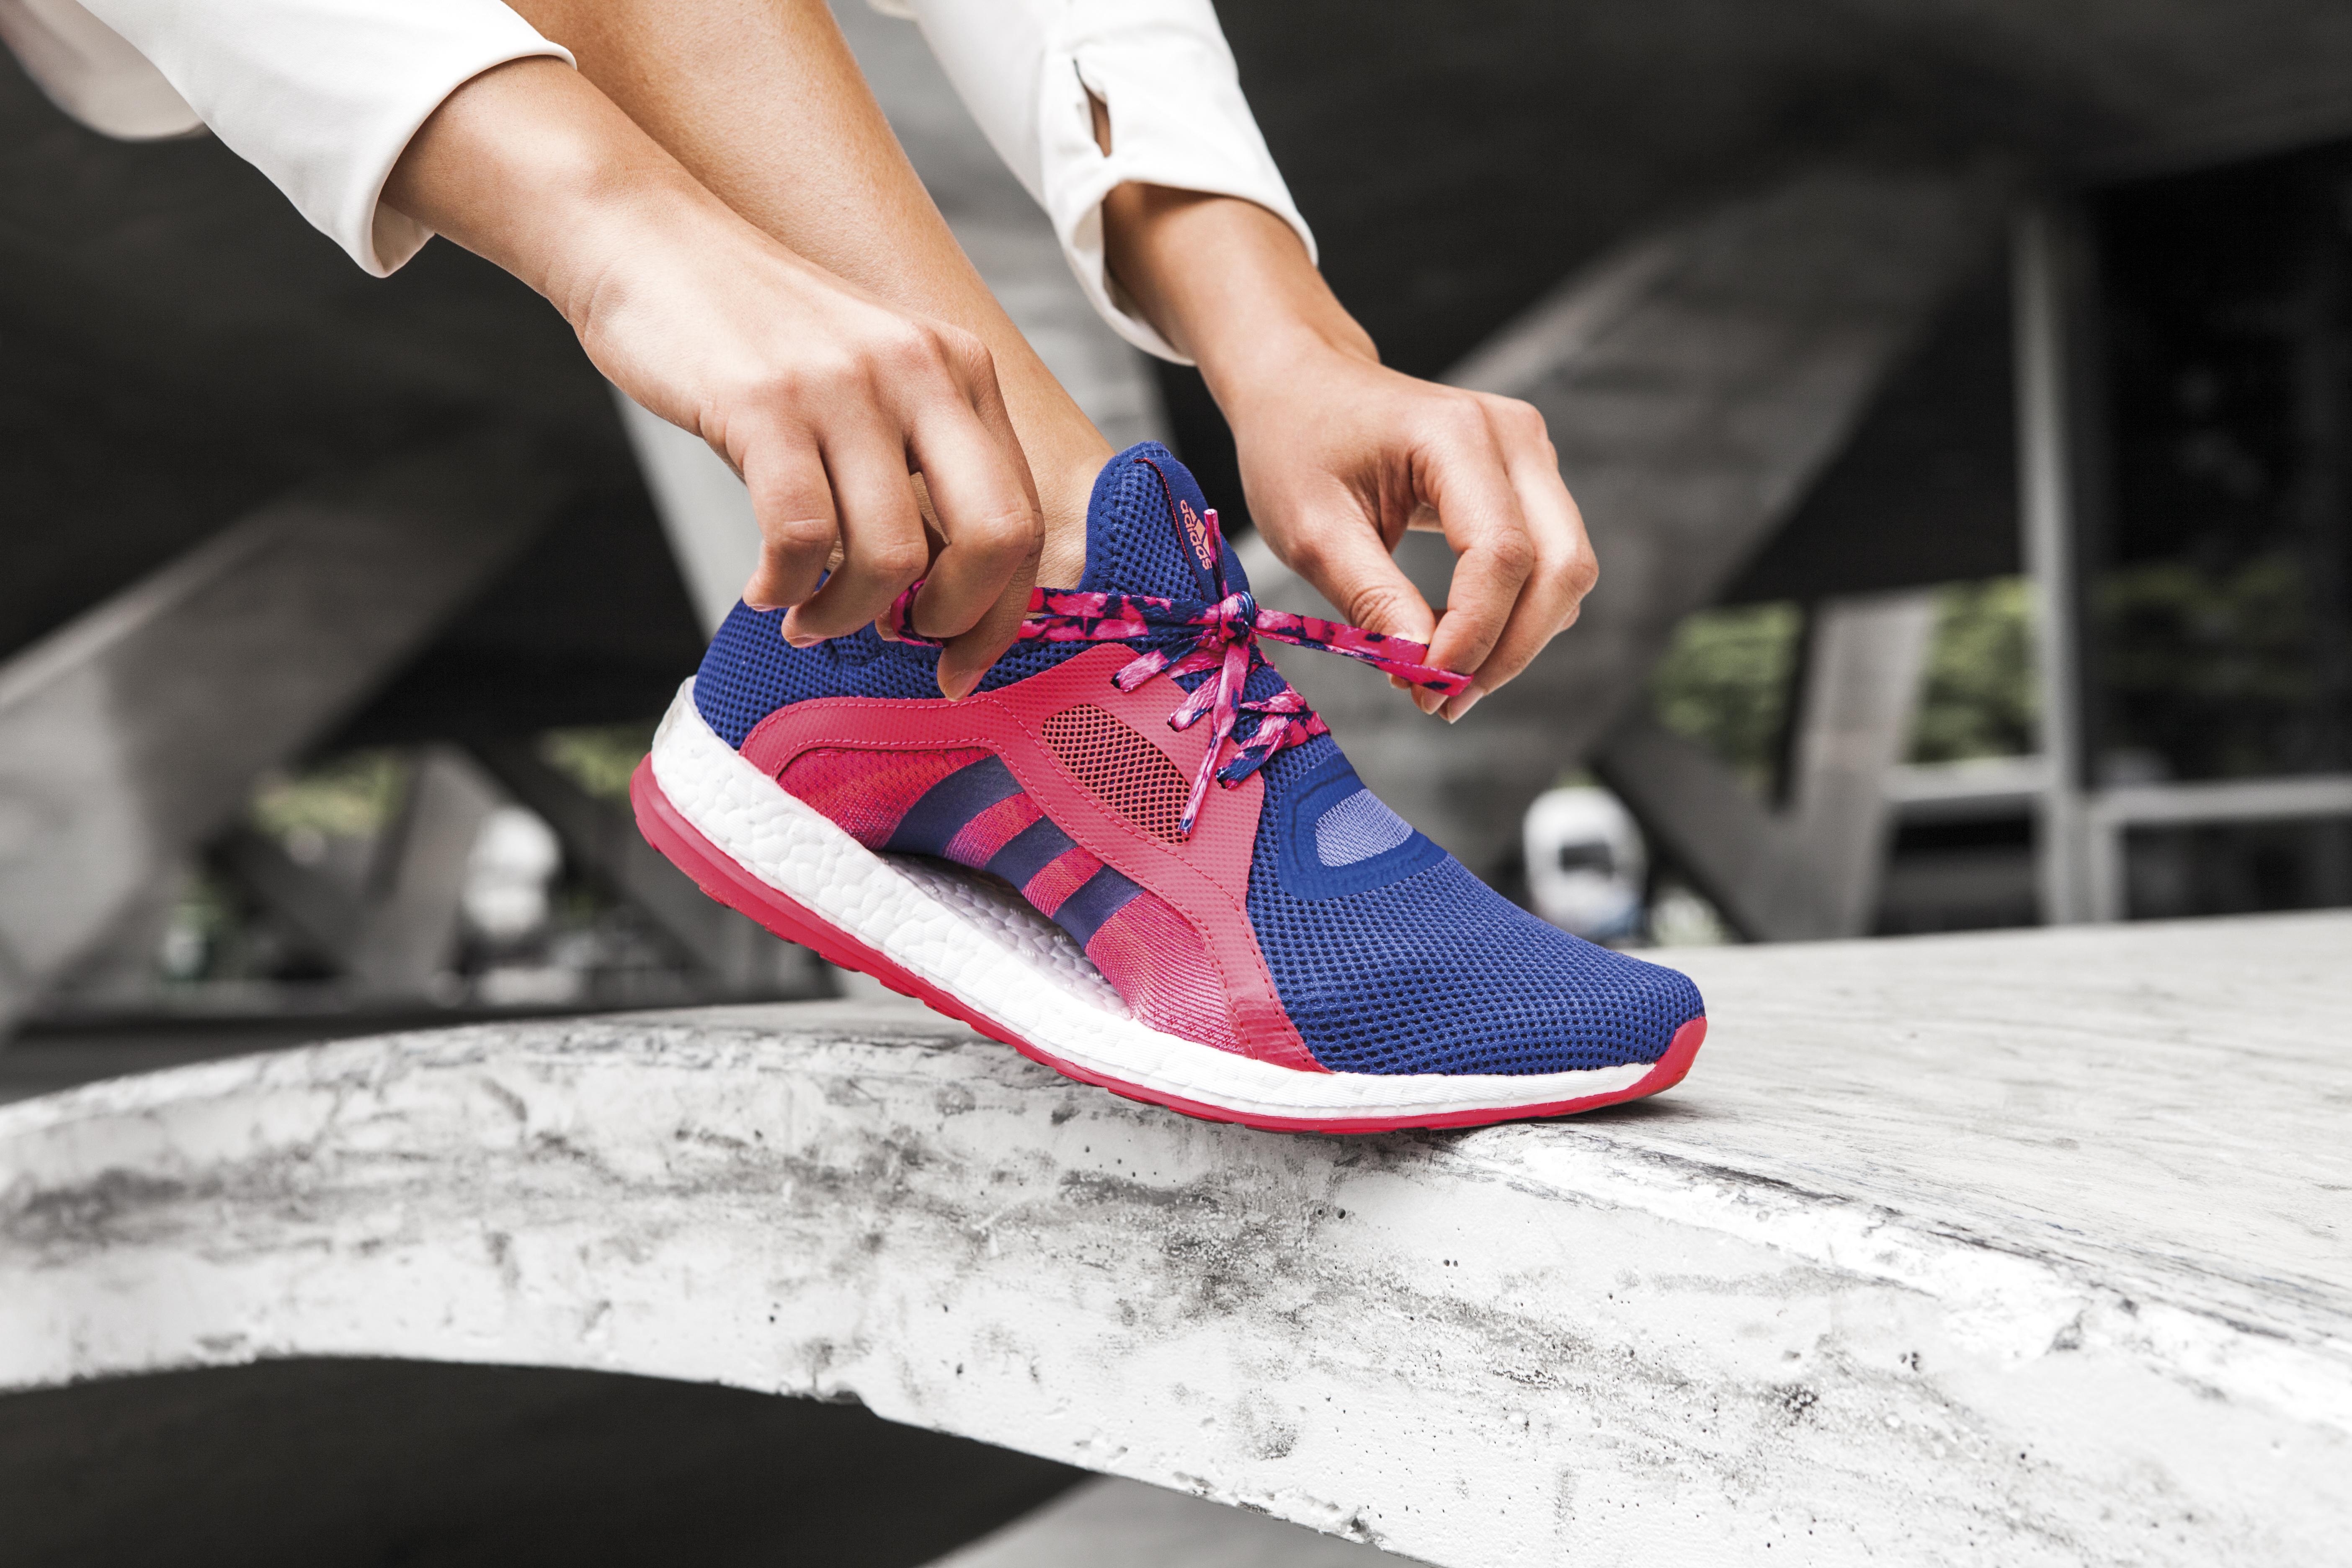 Adidas' PureBOOST X